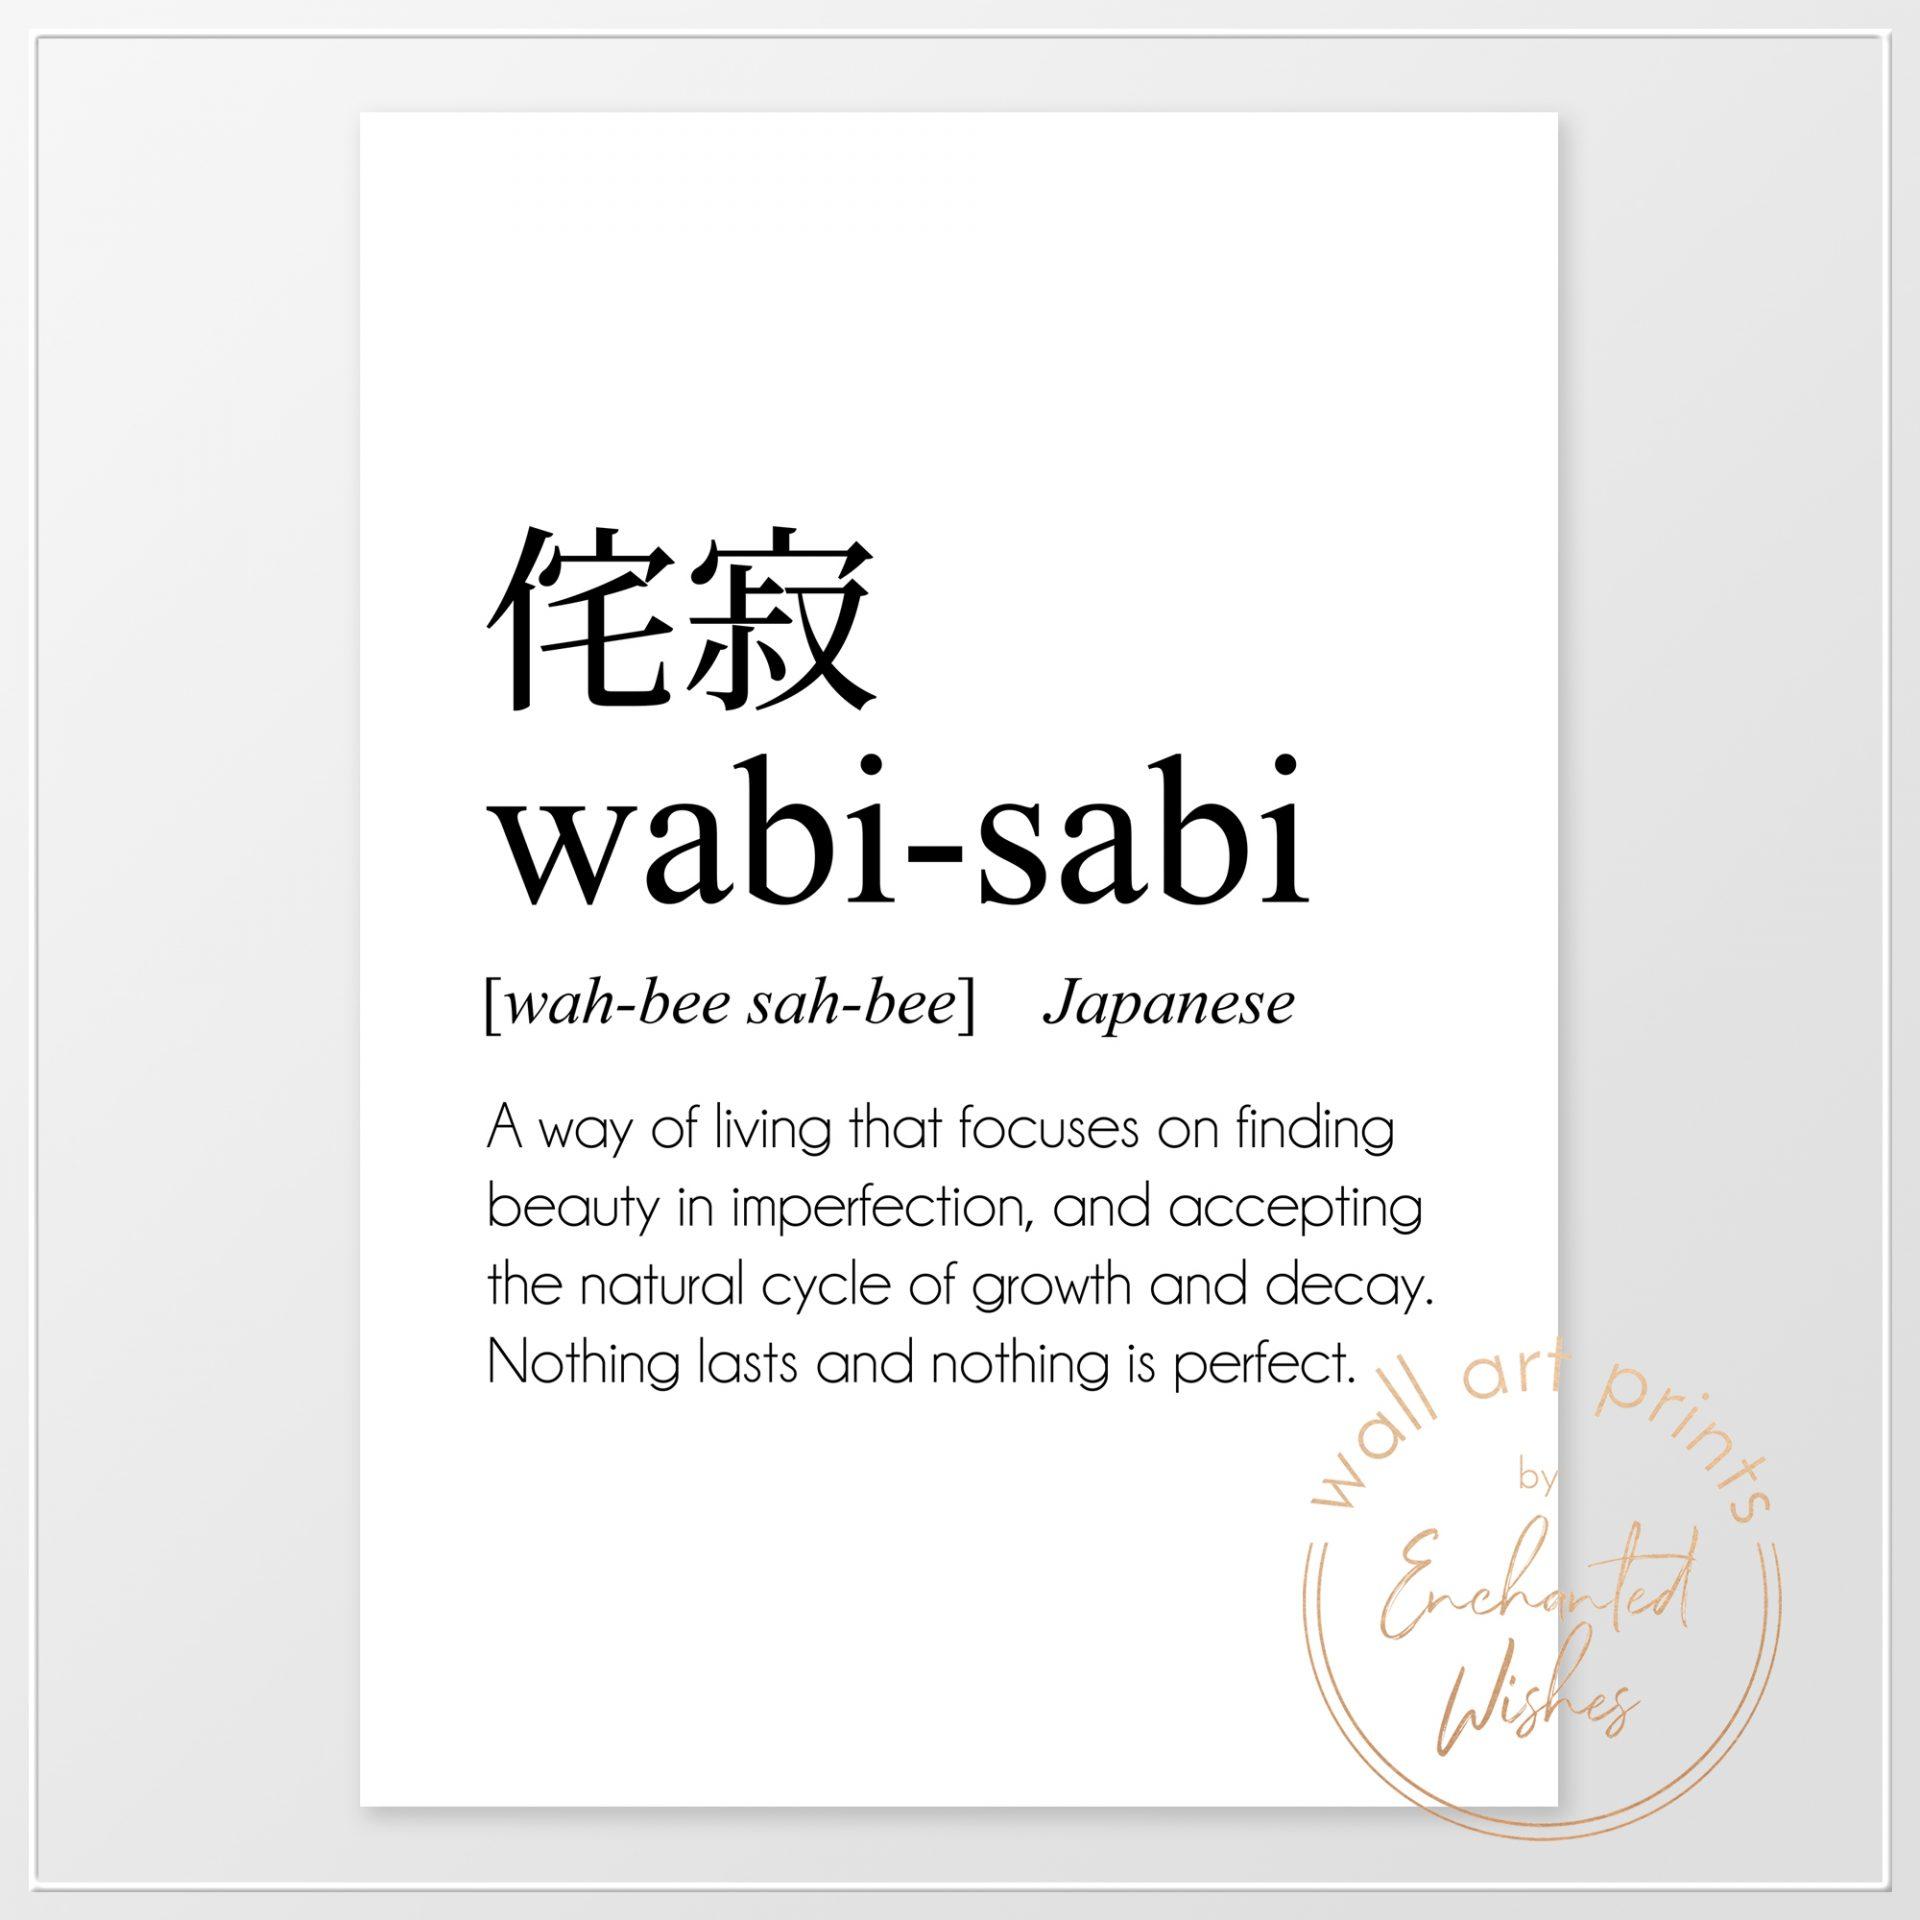 Wabi-sabi definition print